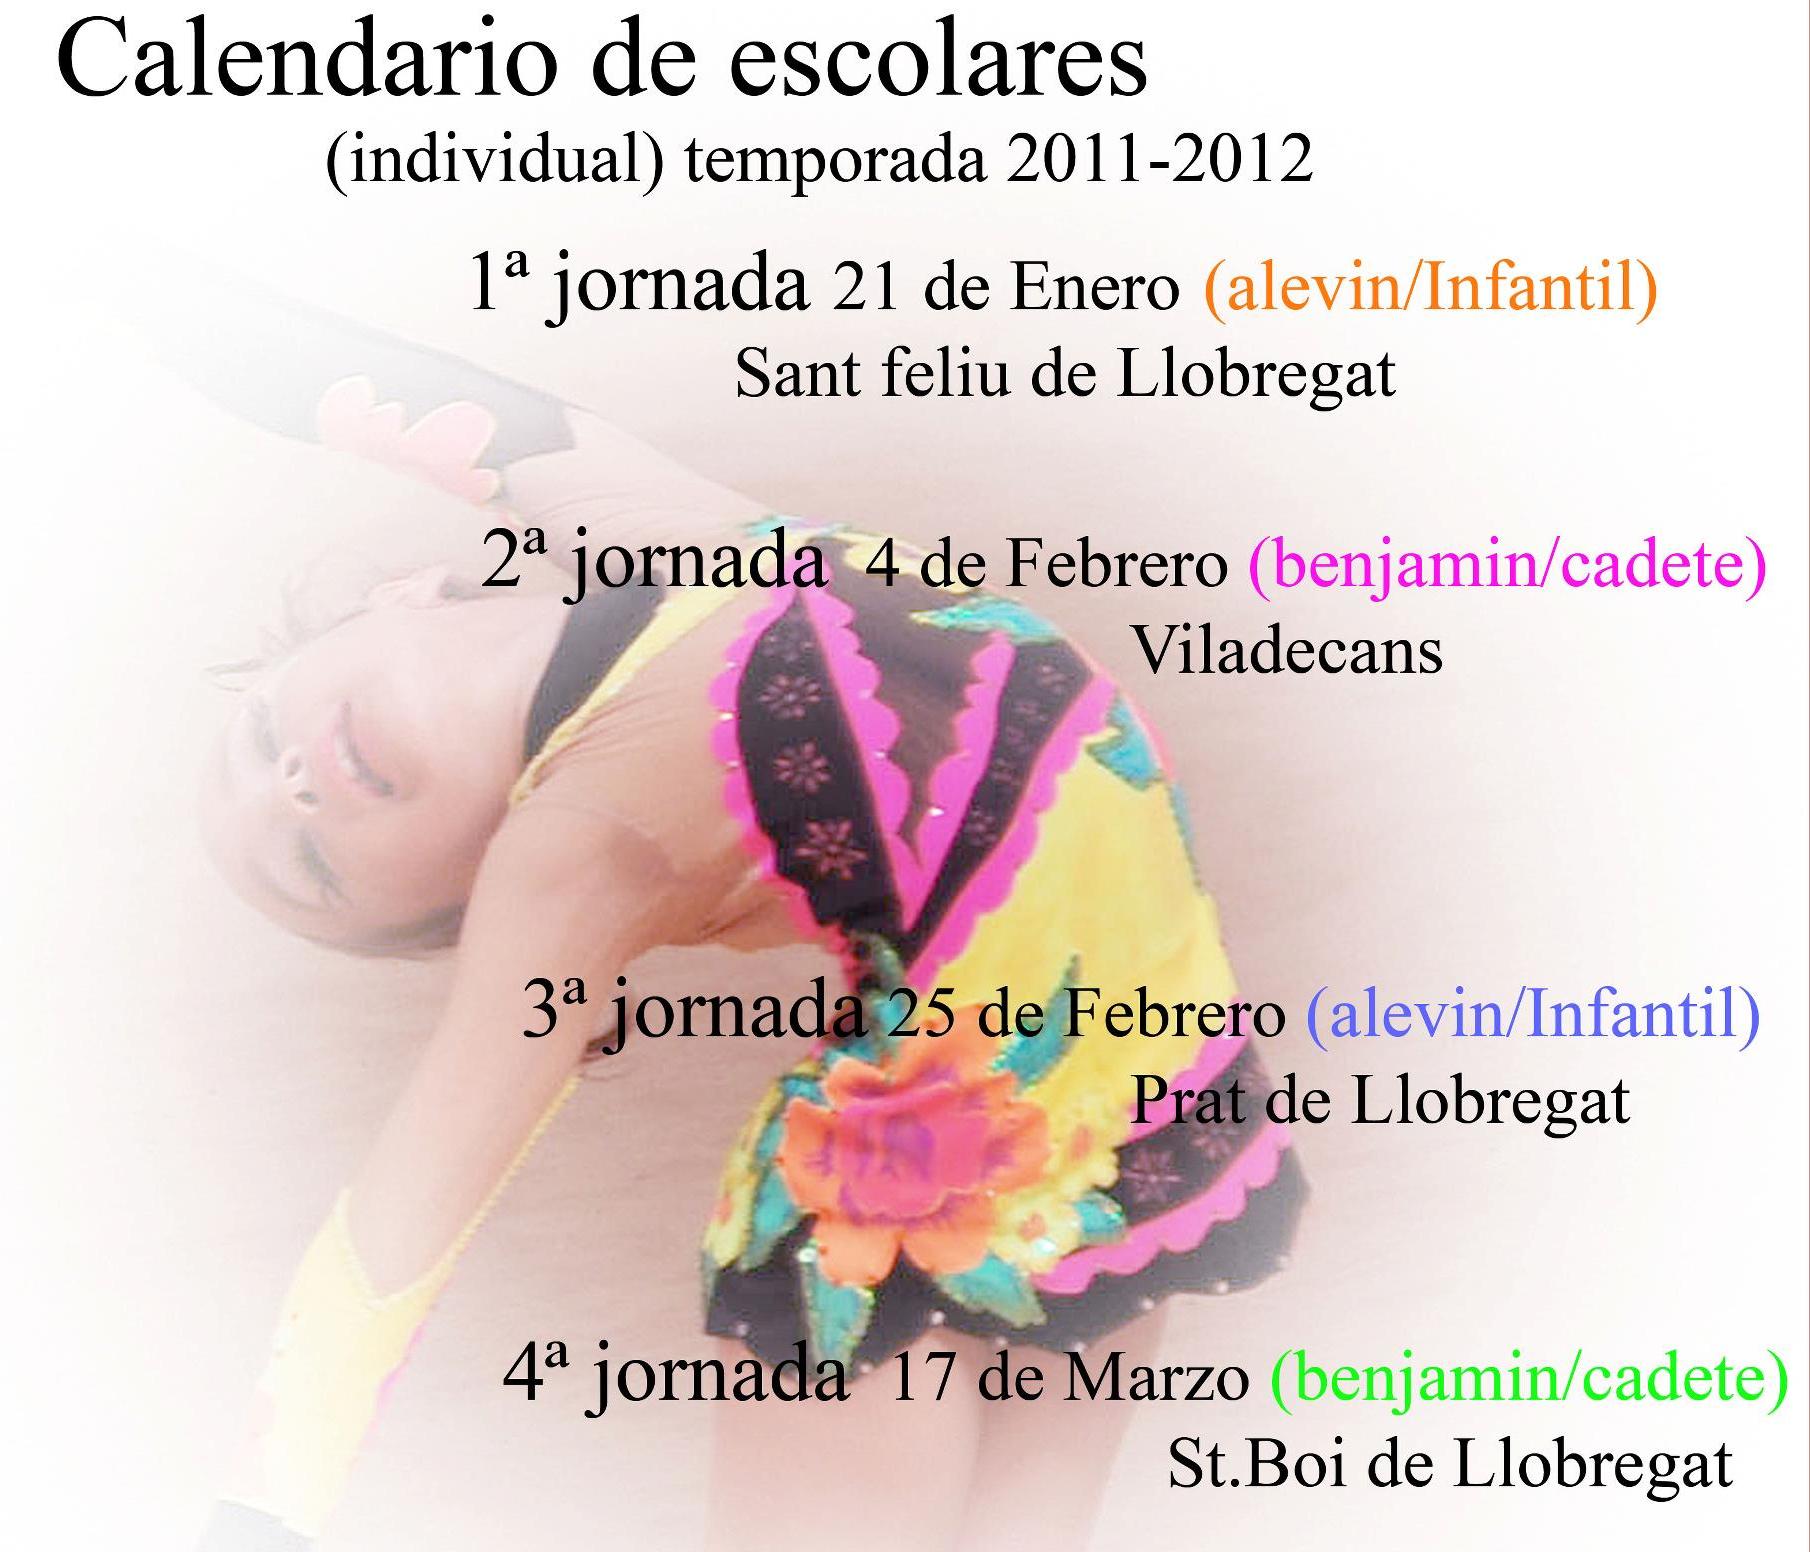 Calendario JJEE's Indiv.